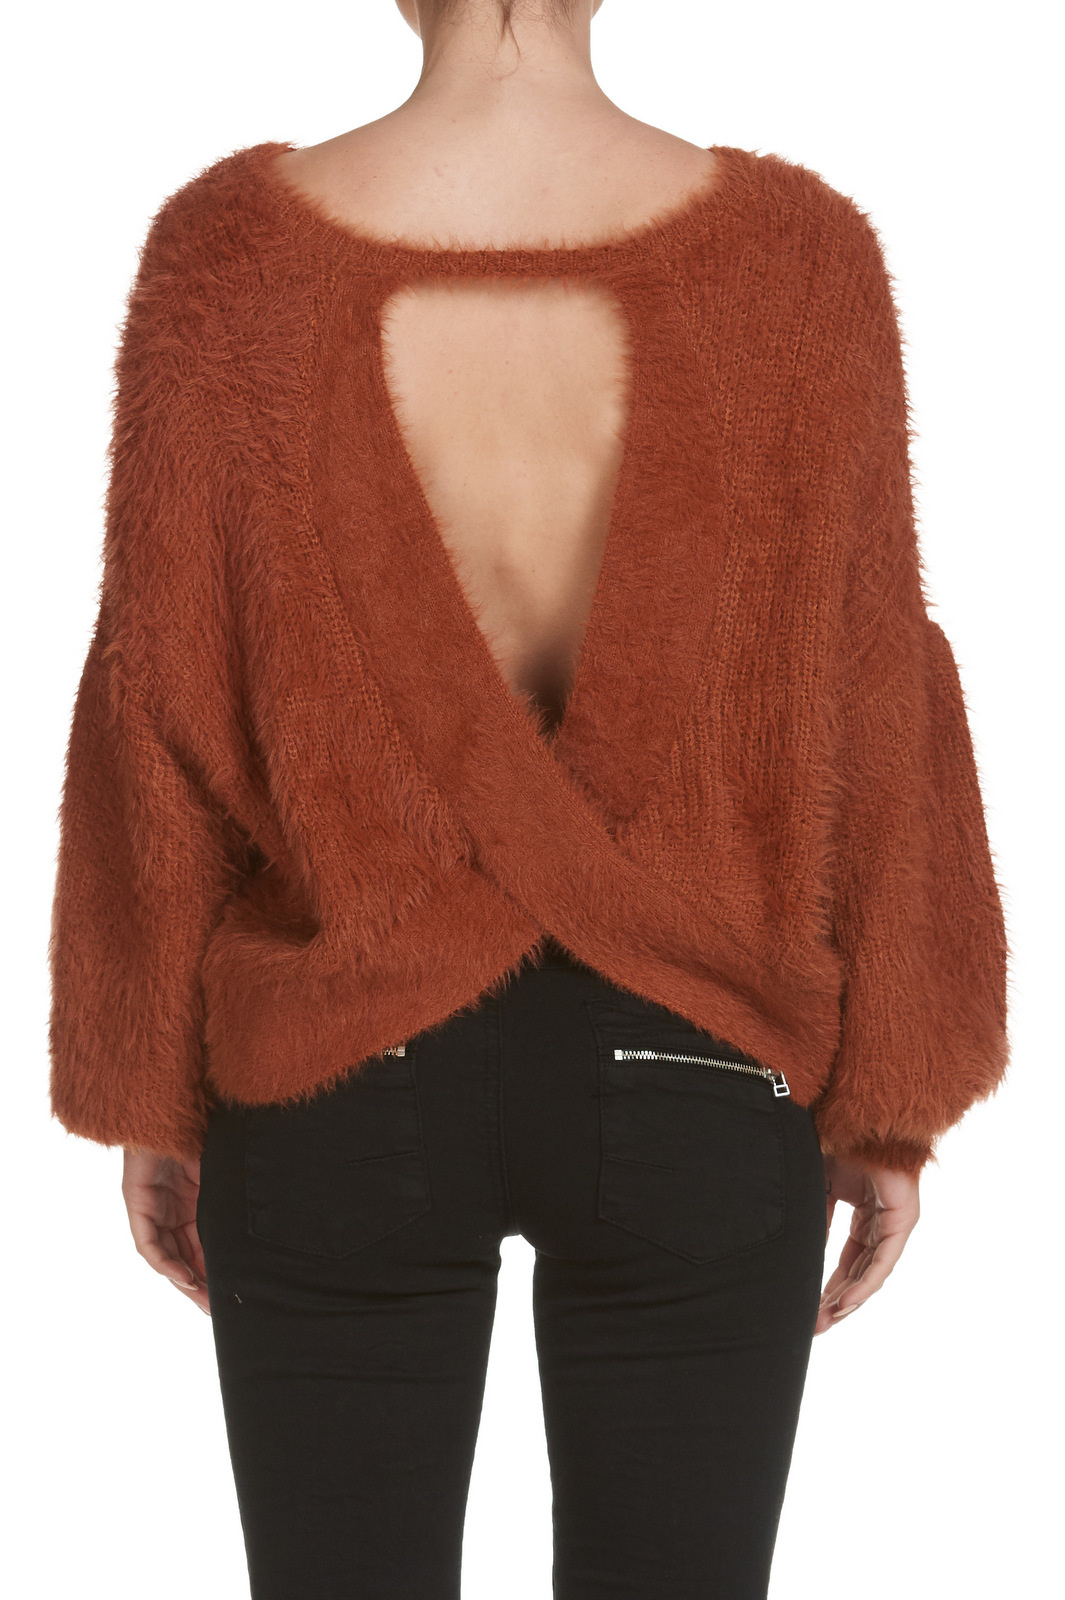 Elan Crossed Back Sweater